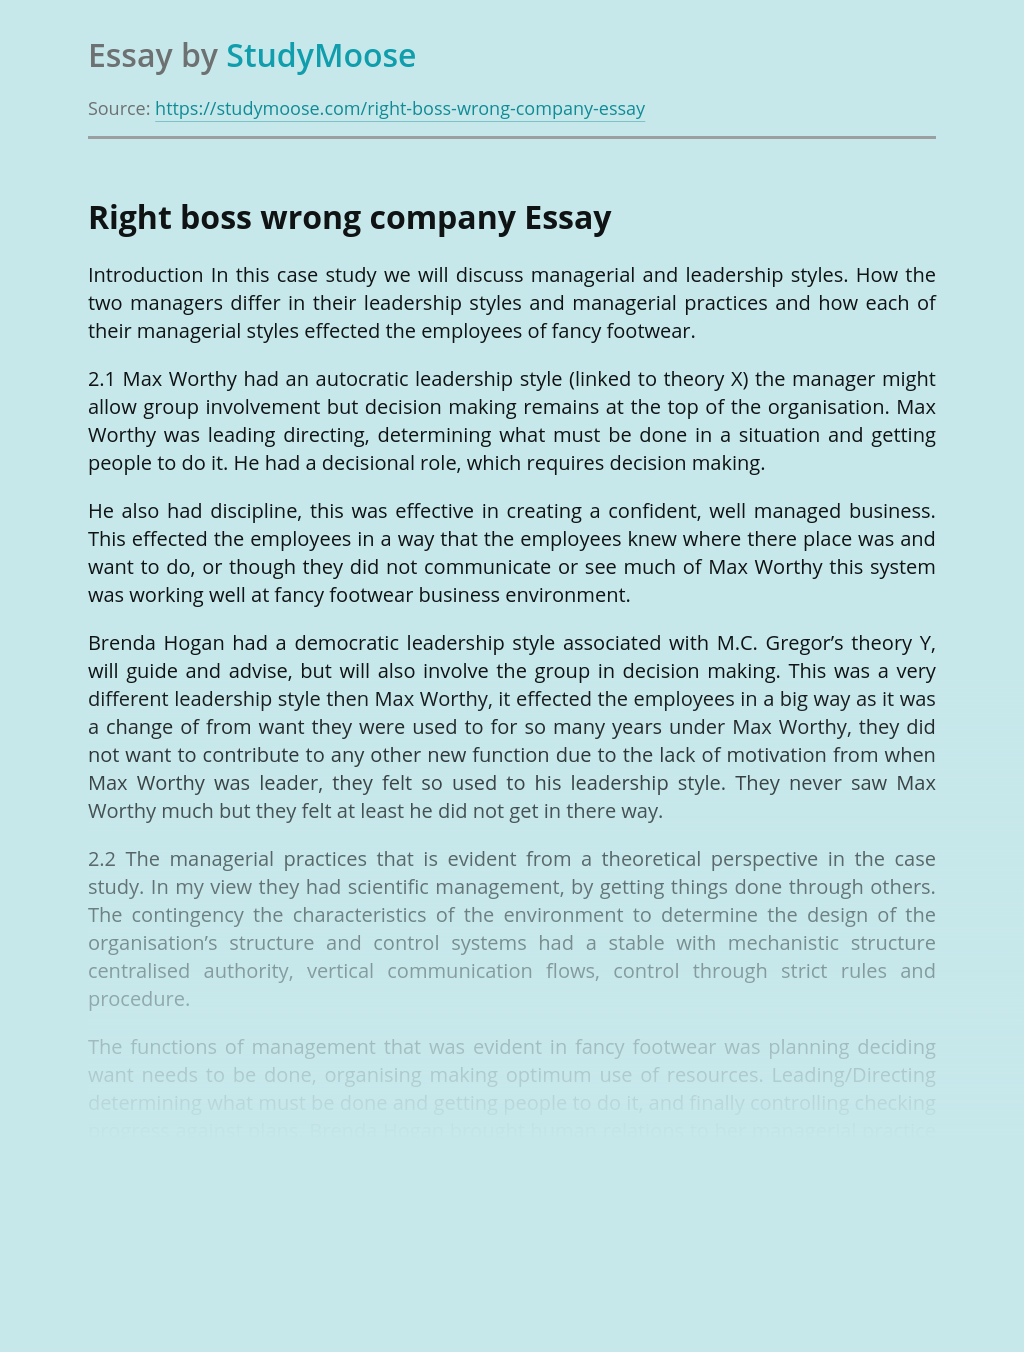 Right boss wrong company